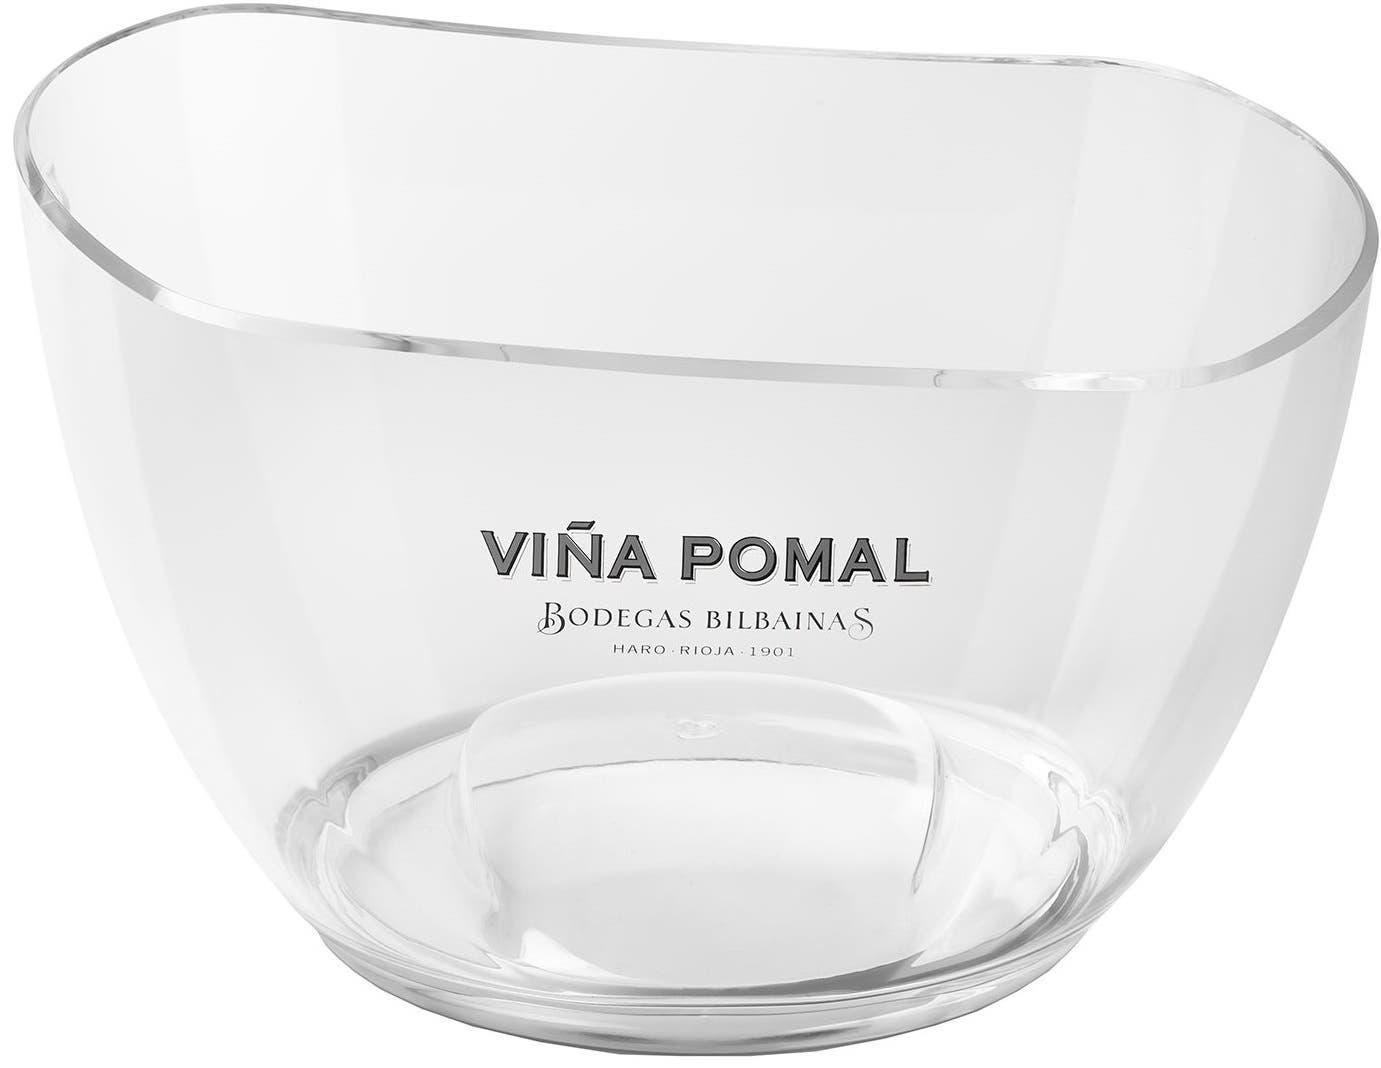 Viña Pomal Transparent Bucket (5-6 bot.)